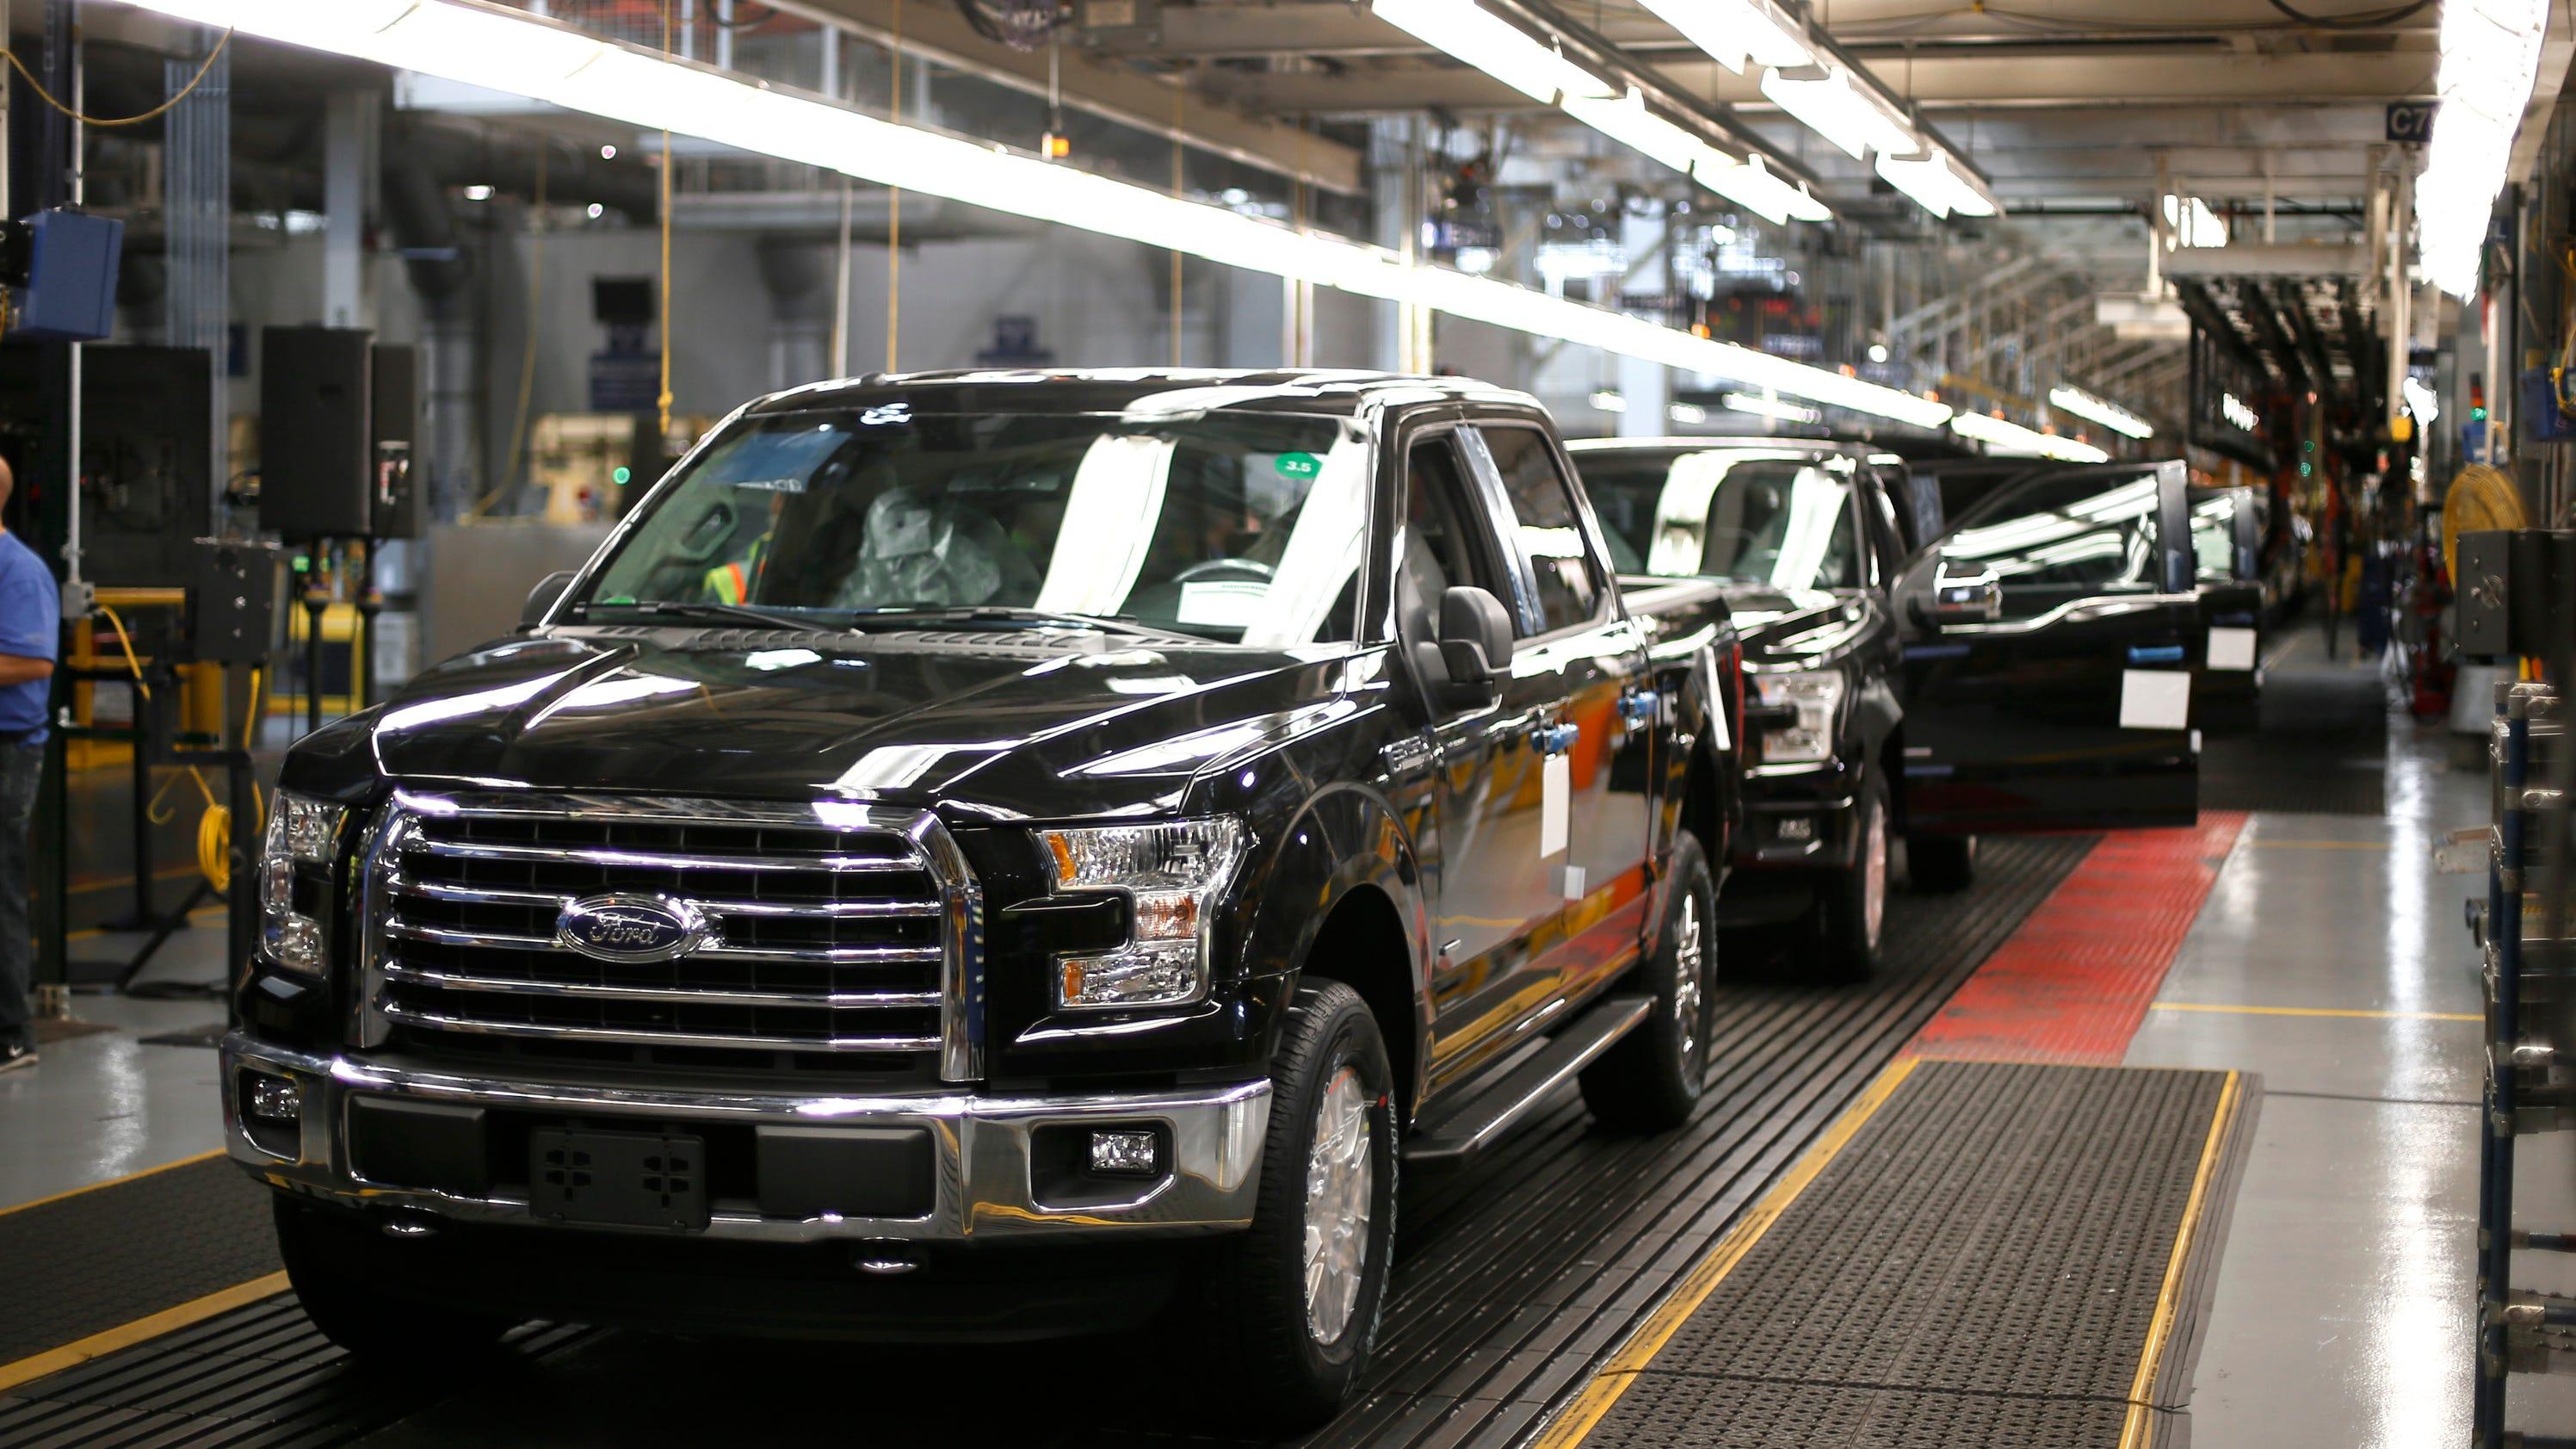 louisville ford plant anticipates aluminum truck jobs. Black Bedroom Furniture Sets. Home Design Ideas